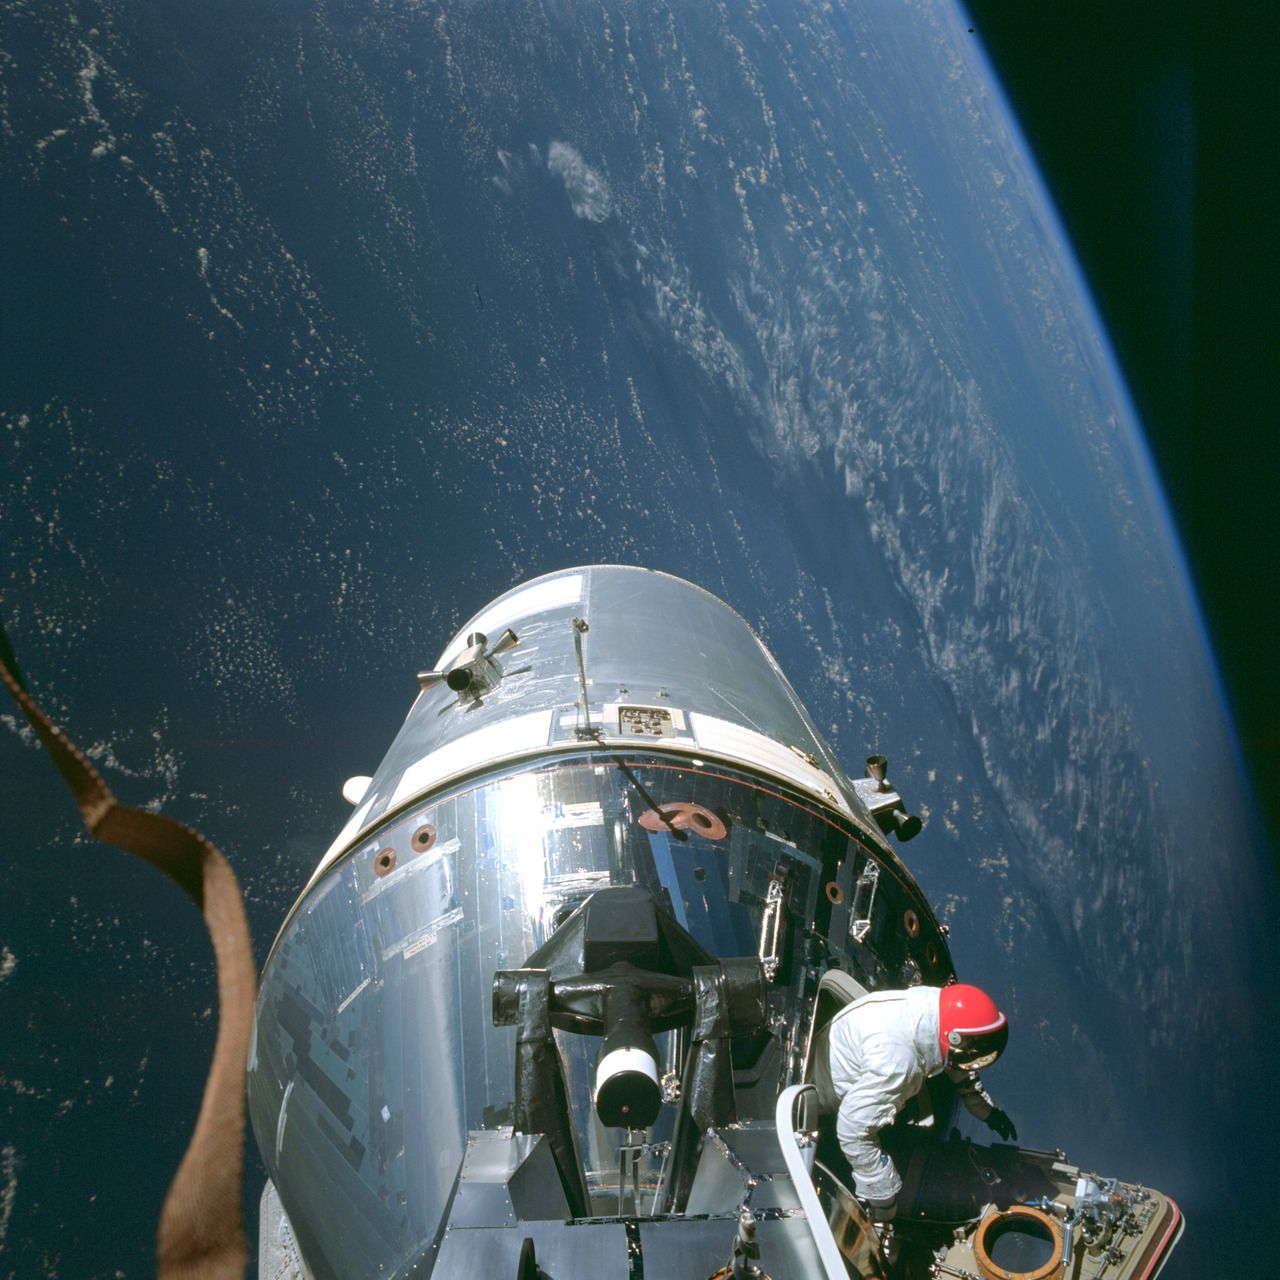 apollo space program history - photo #32